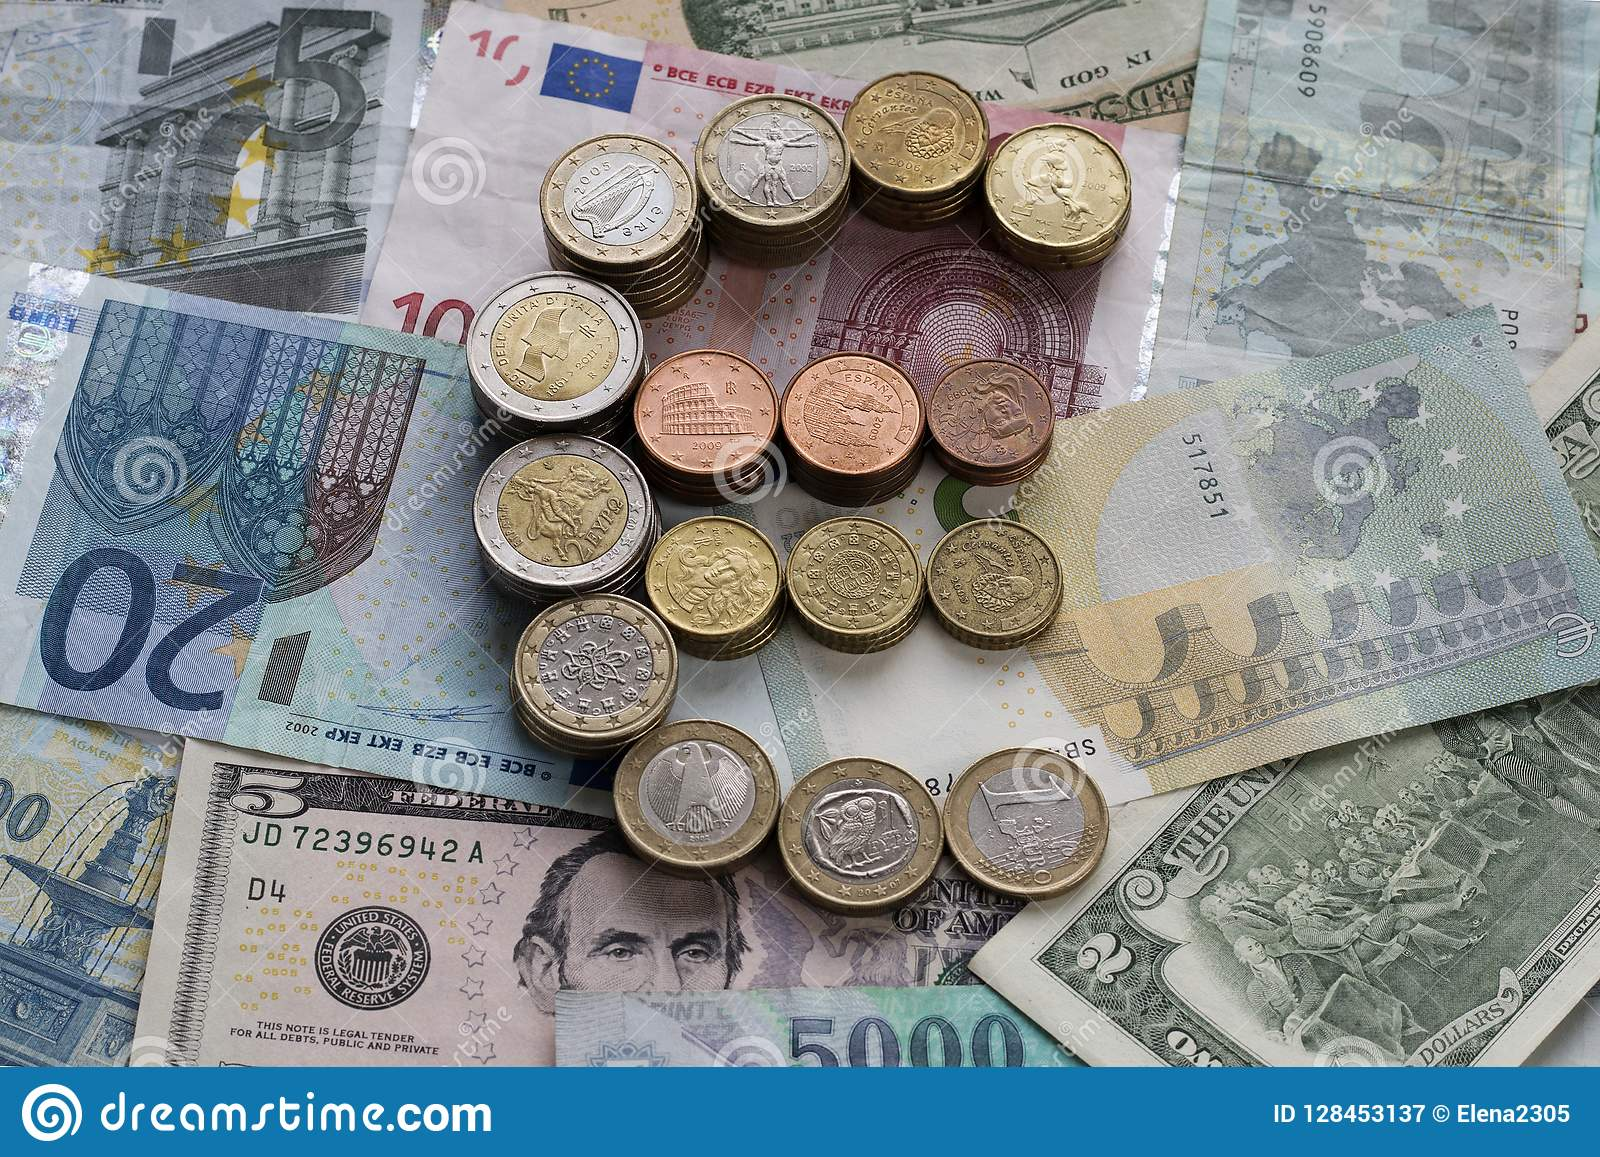 Euro sign made of euro coins